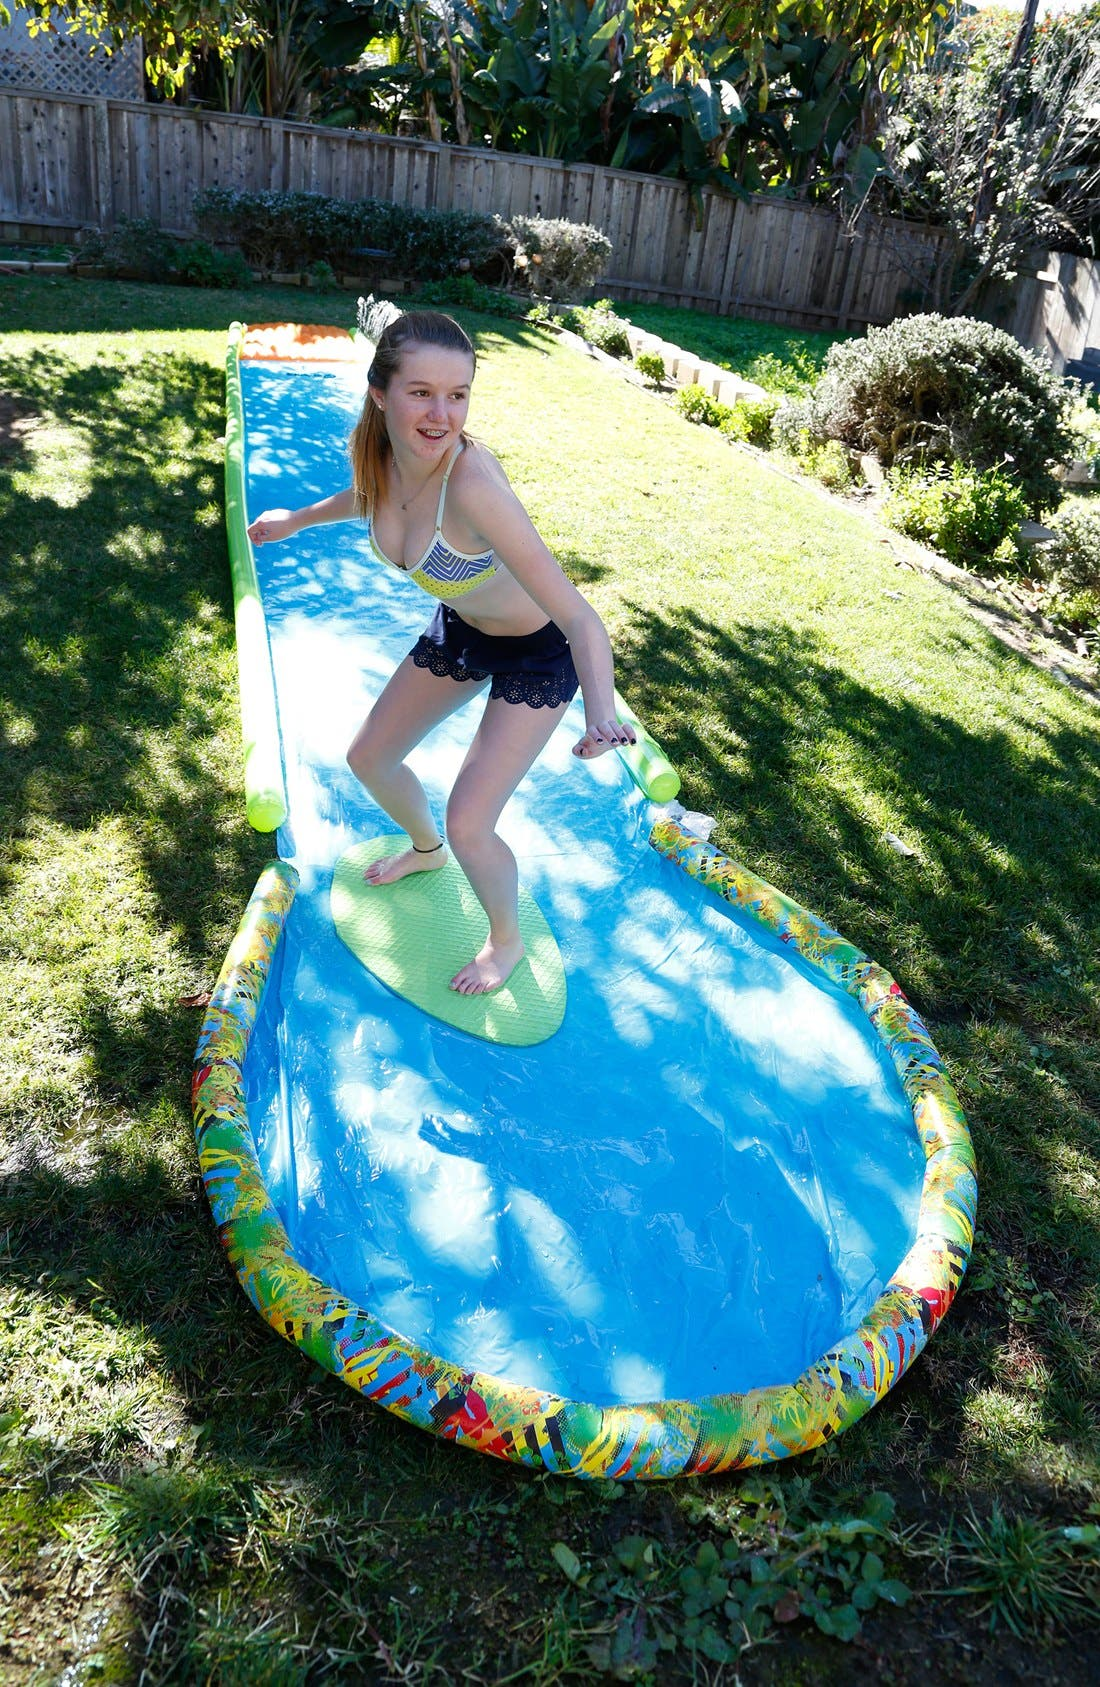 'Slackers Slide & Surf - Screamin' 30-Inch Wooden Skimboard,                             Alternate thumbnail 2, color,                             GREEN